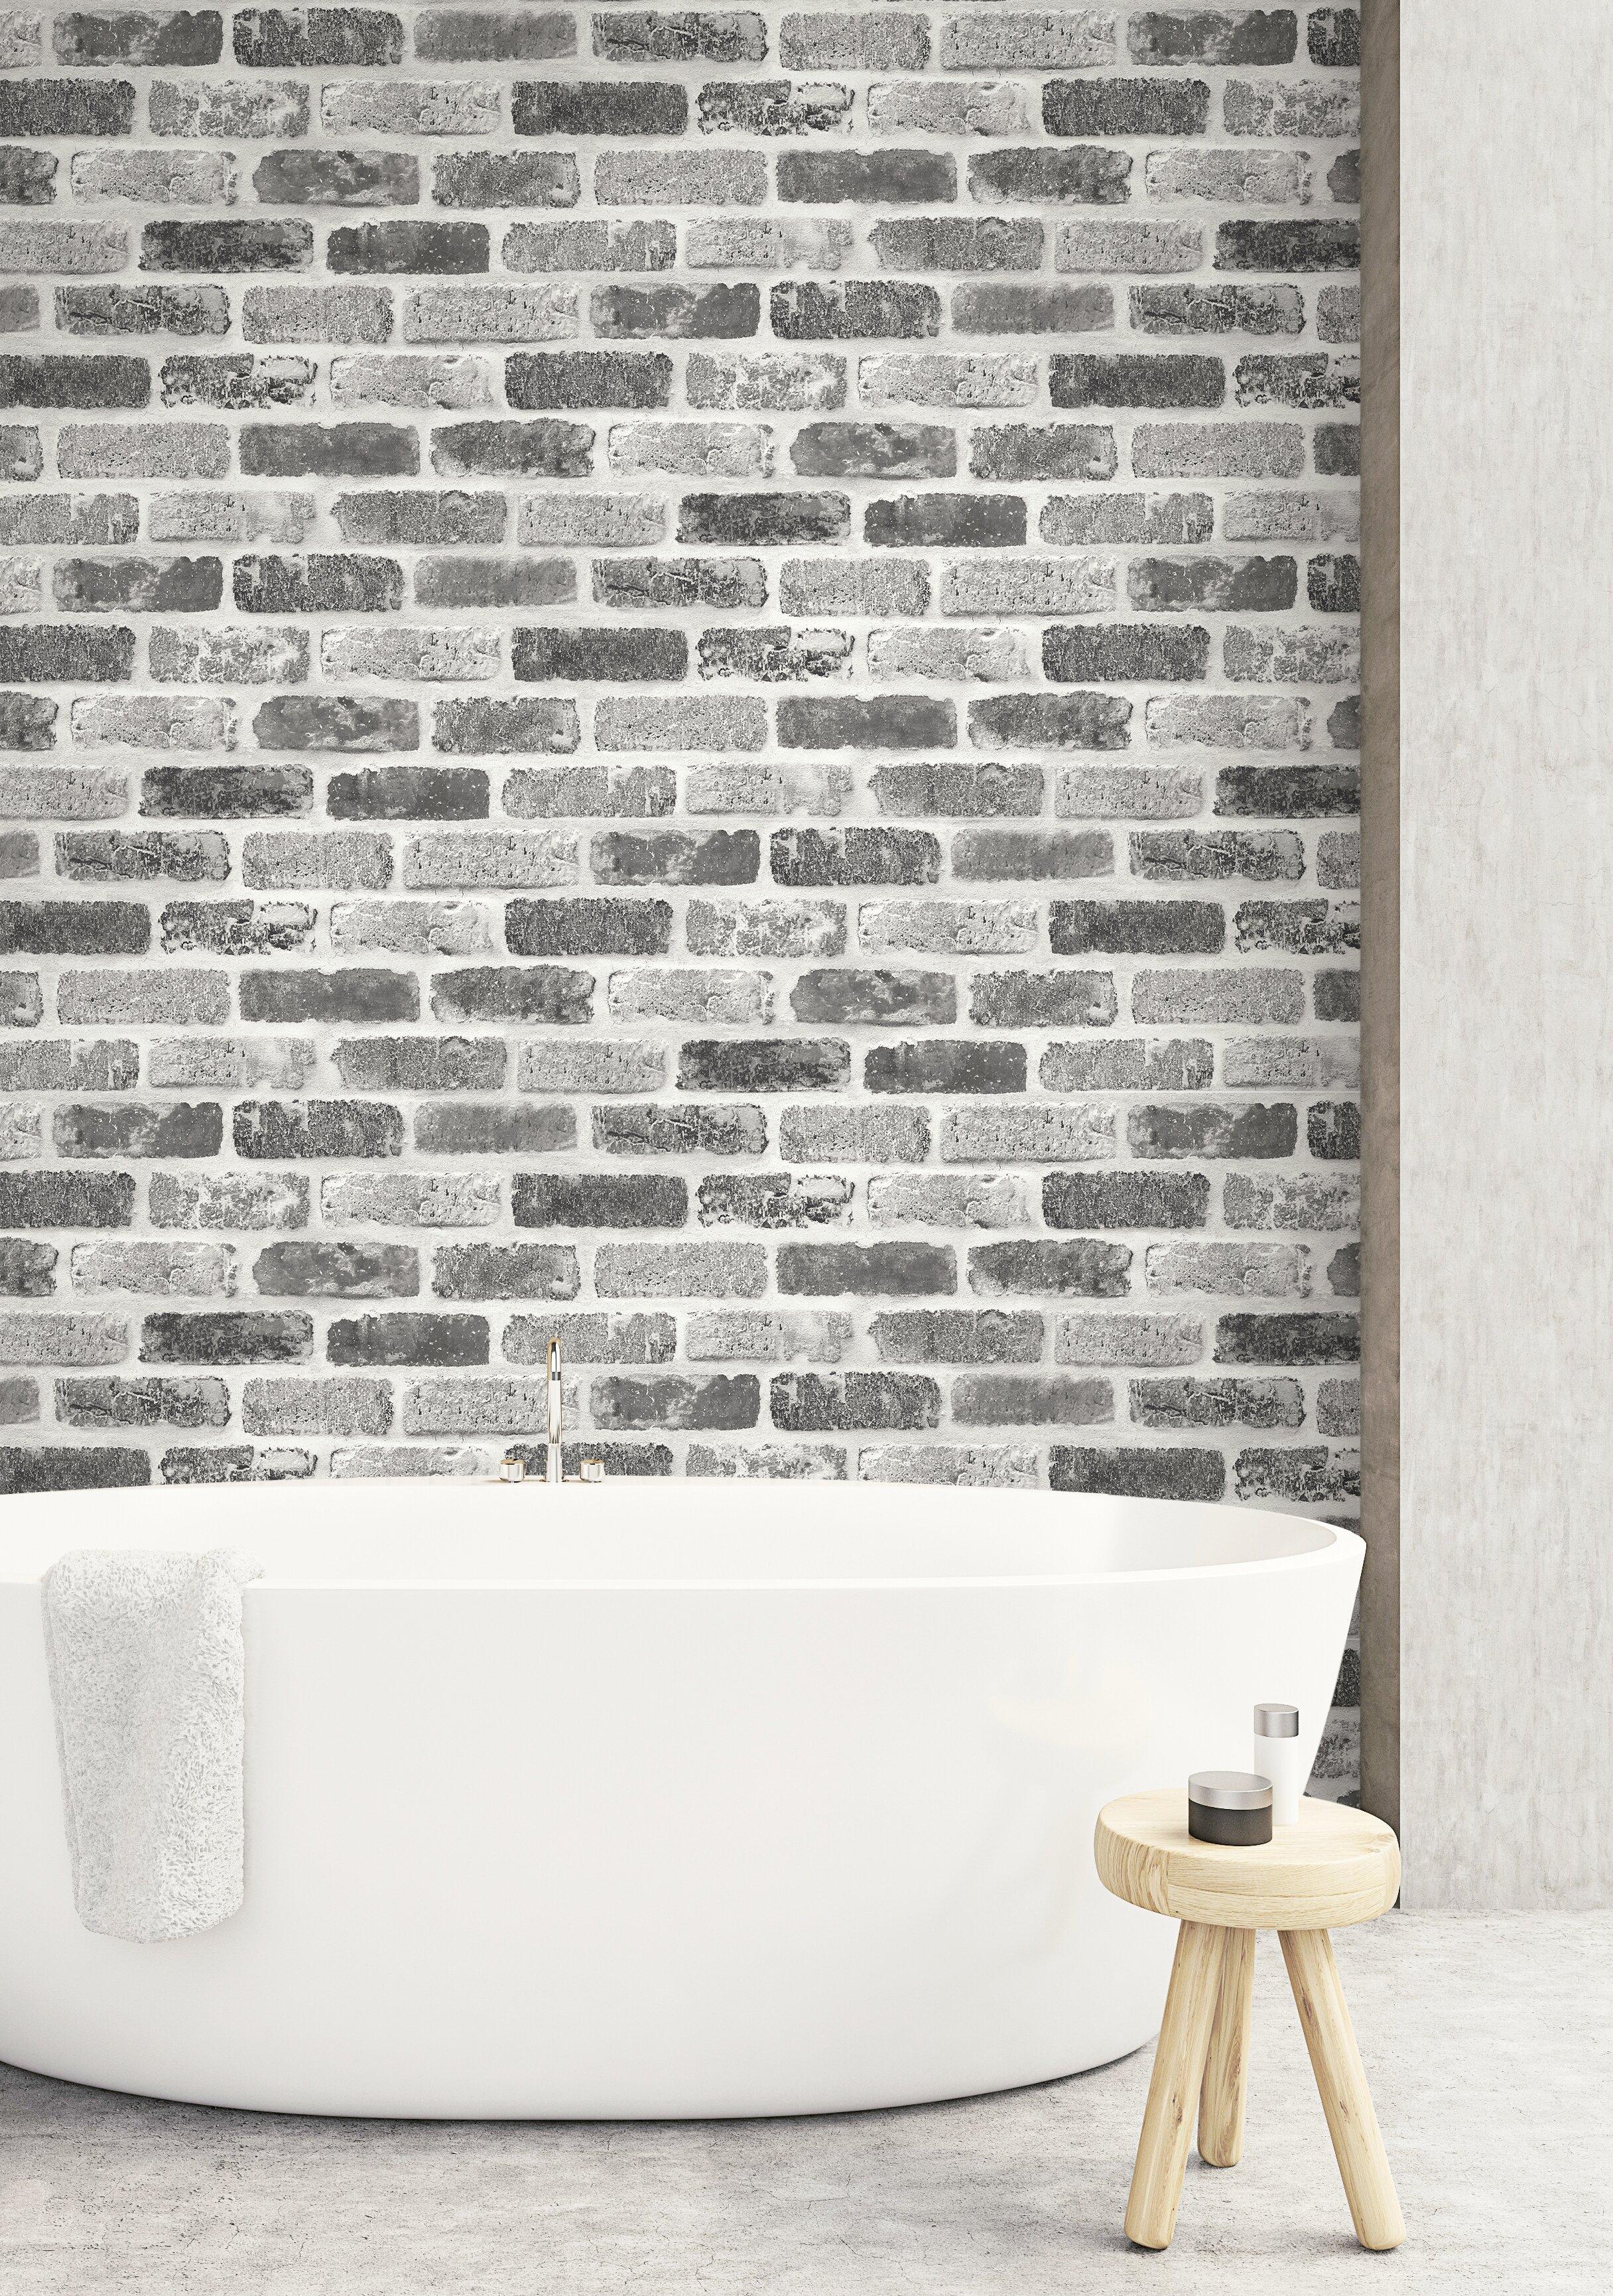 Williston Forge Rosalinda Washed Faux Brick 18 L X 20 5 W And Stick Wallpaper Roll Wayfair